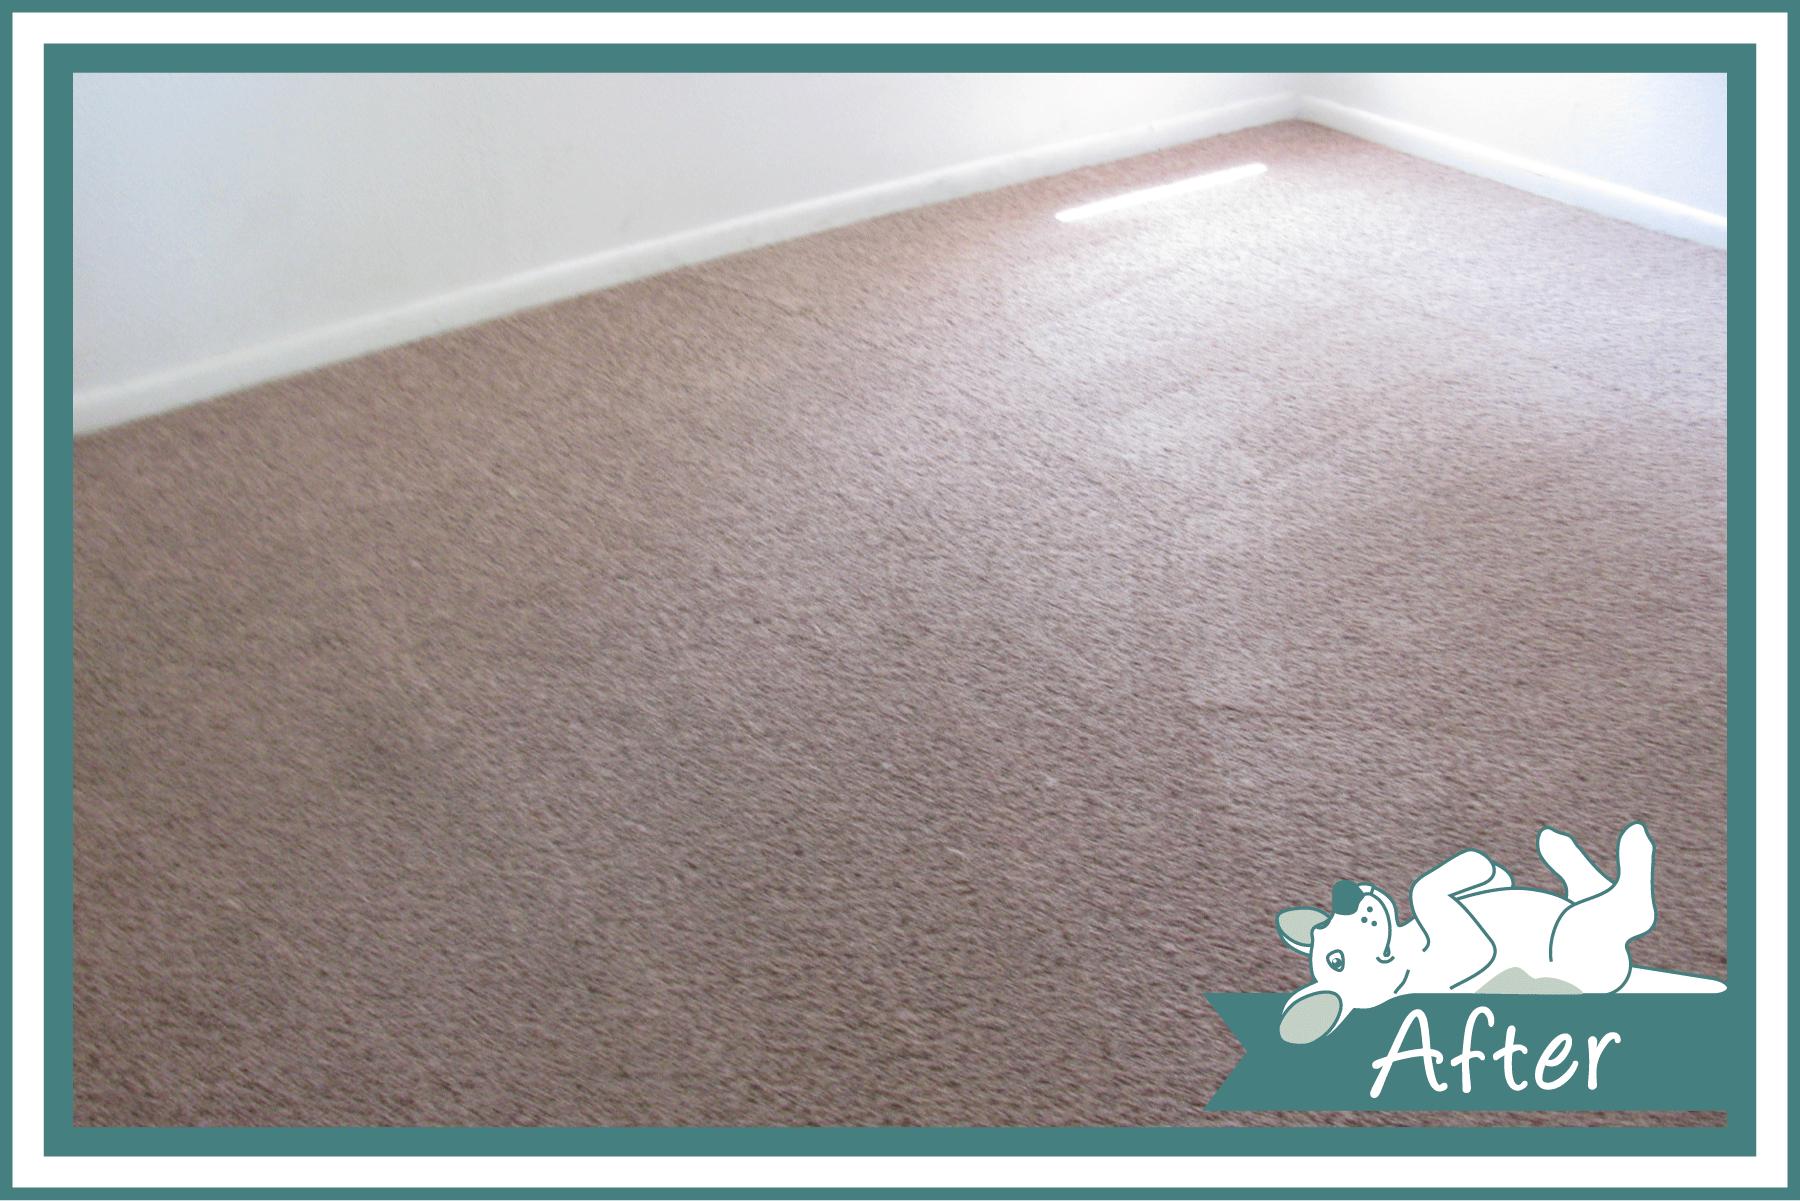 Dog-Gone-Clean-Carpet_WEB-BEFORE-AFTER_Gallery3_v1.png